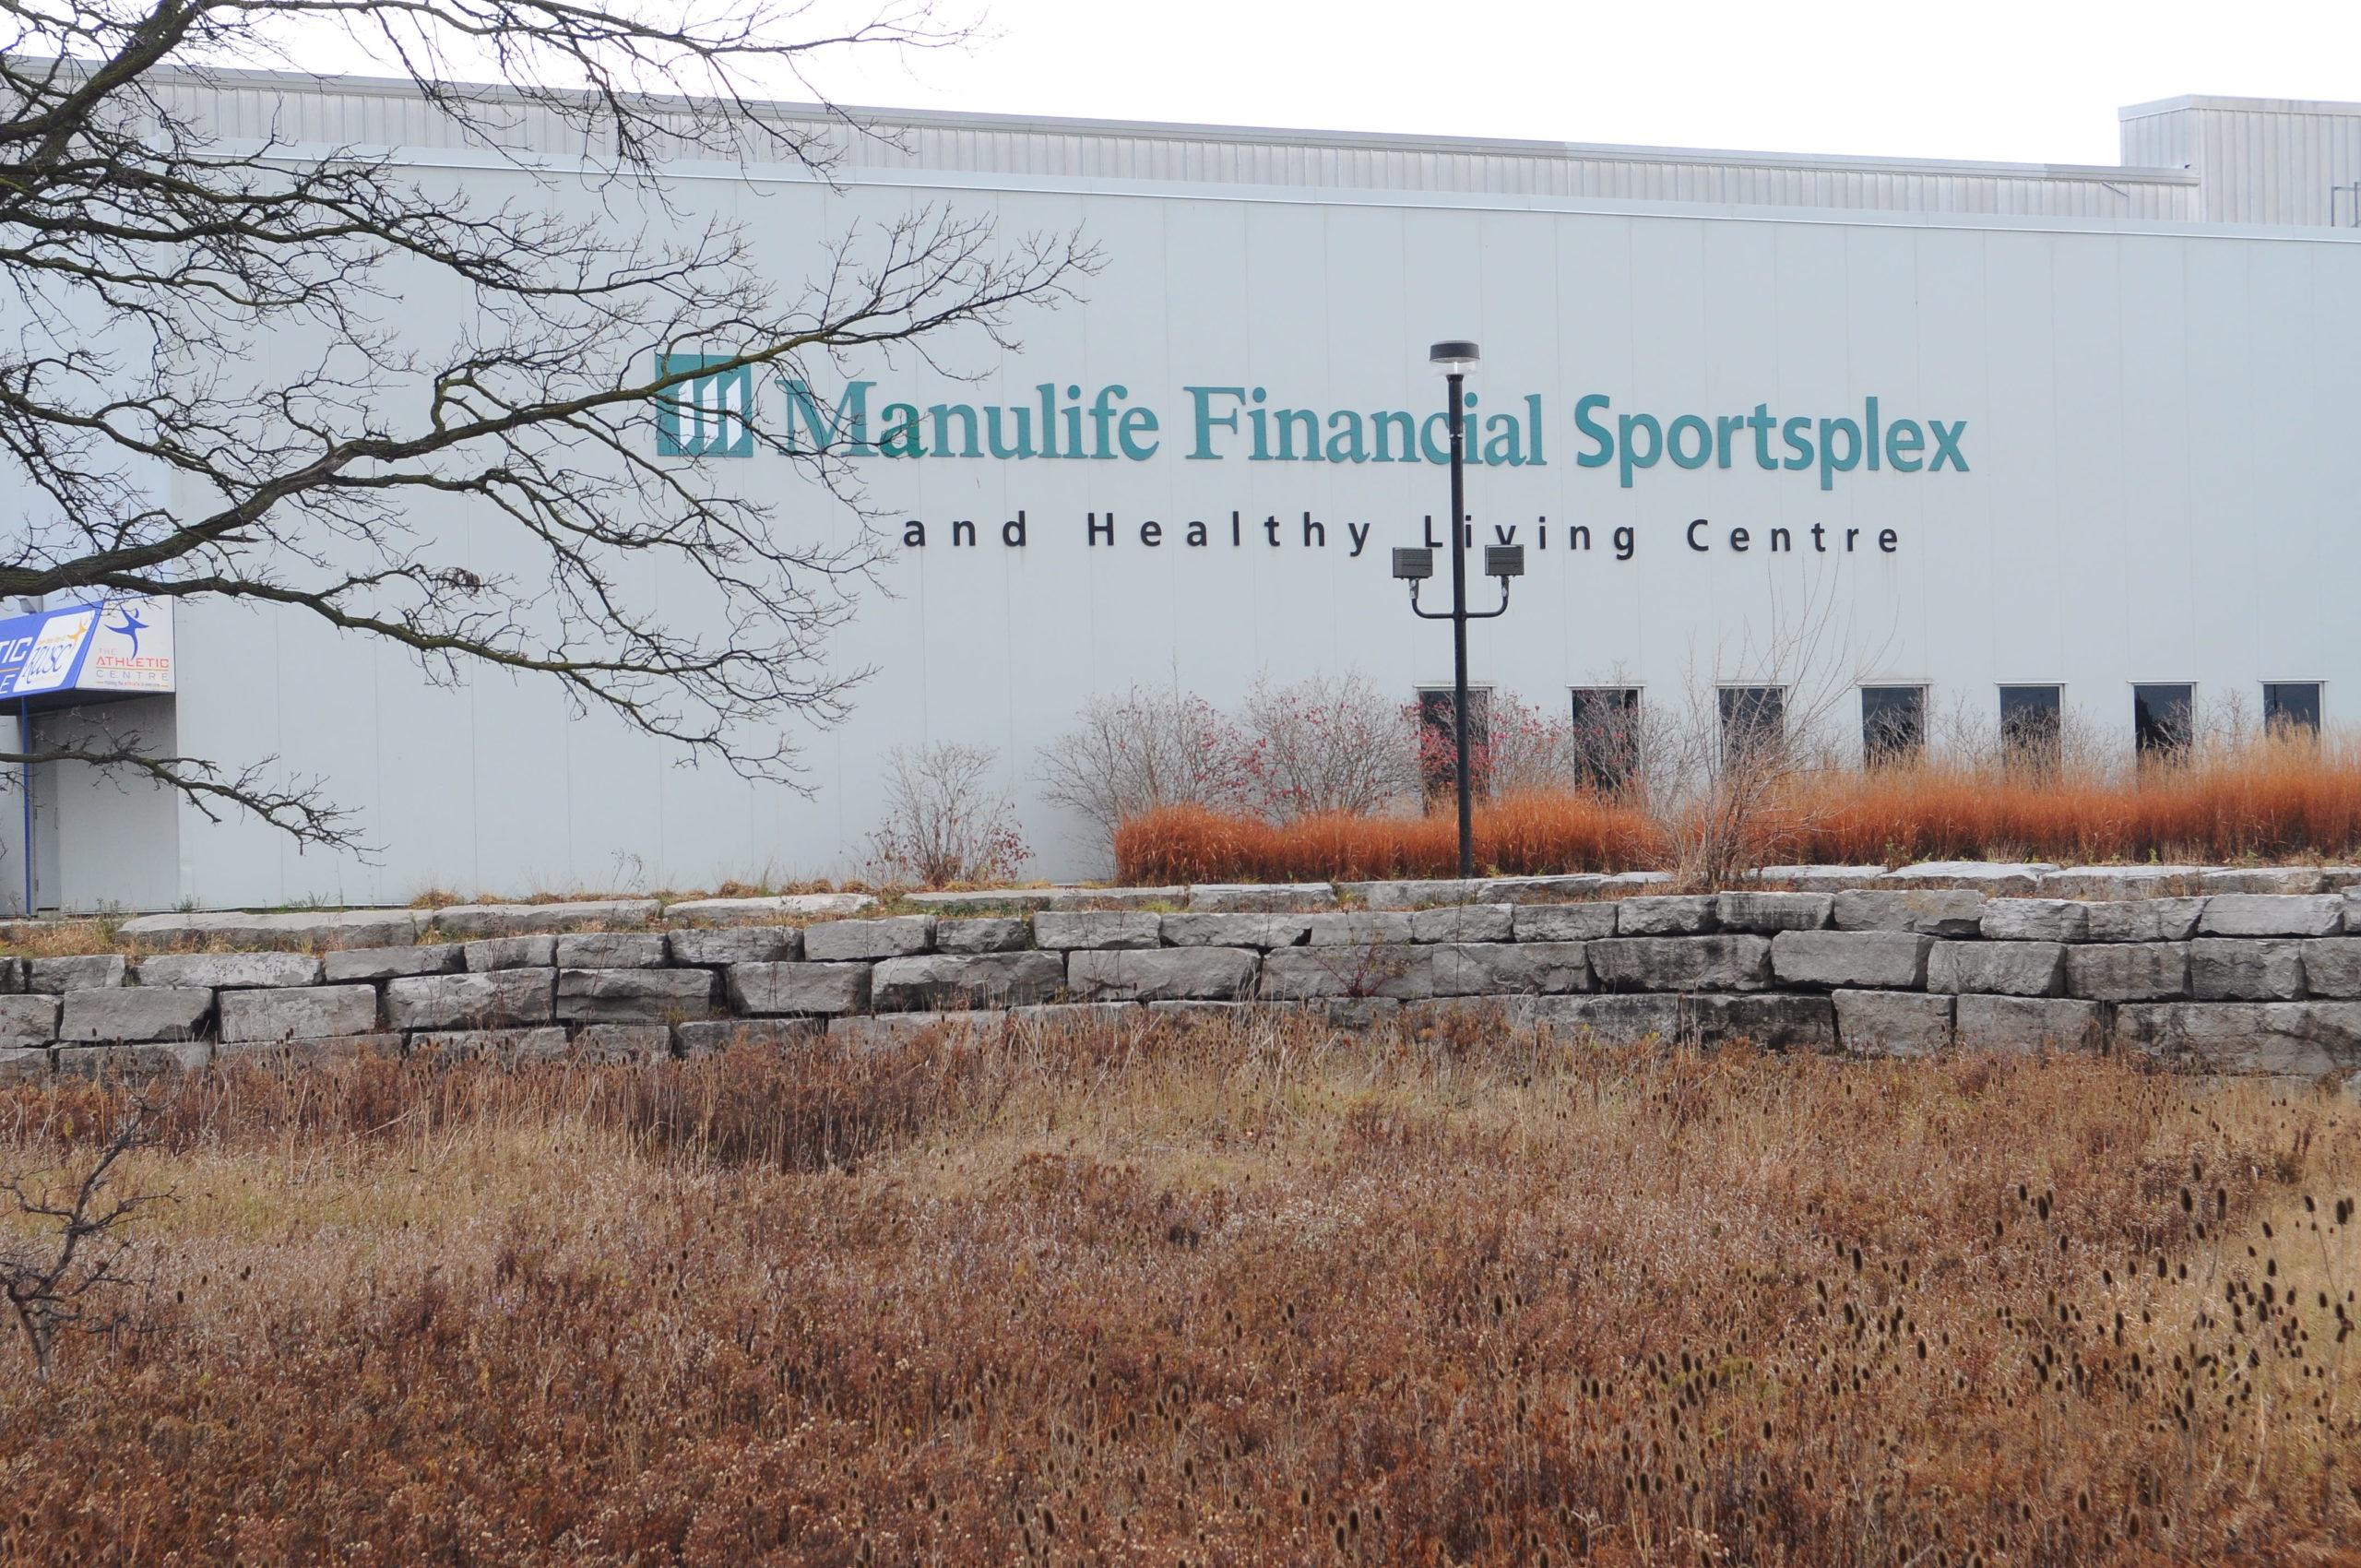 Manulife Financial Sportsplex